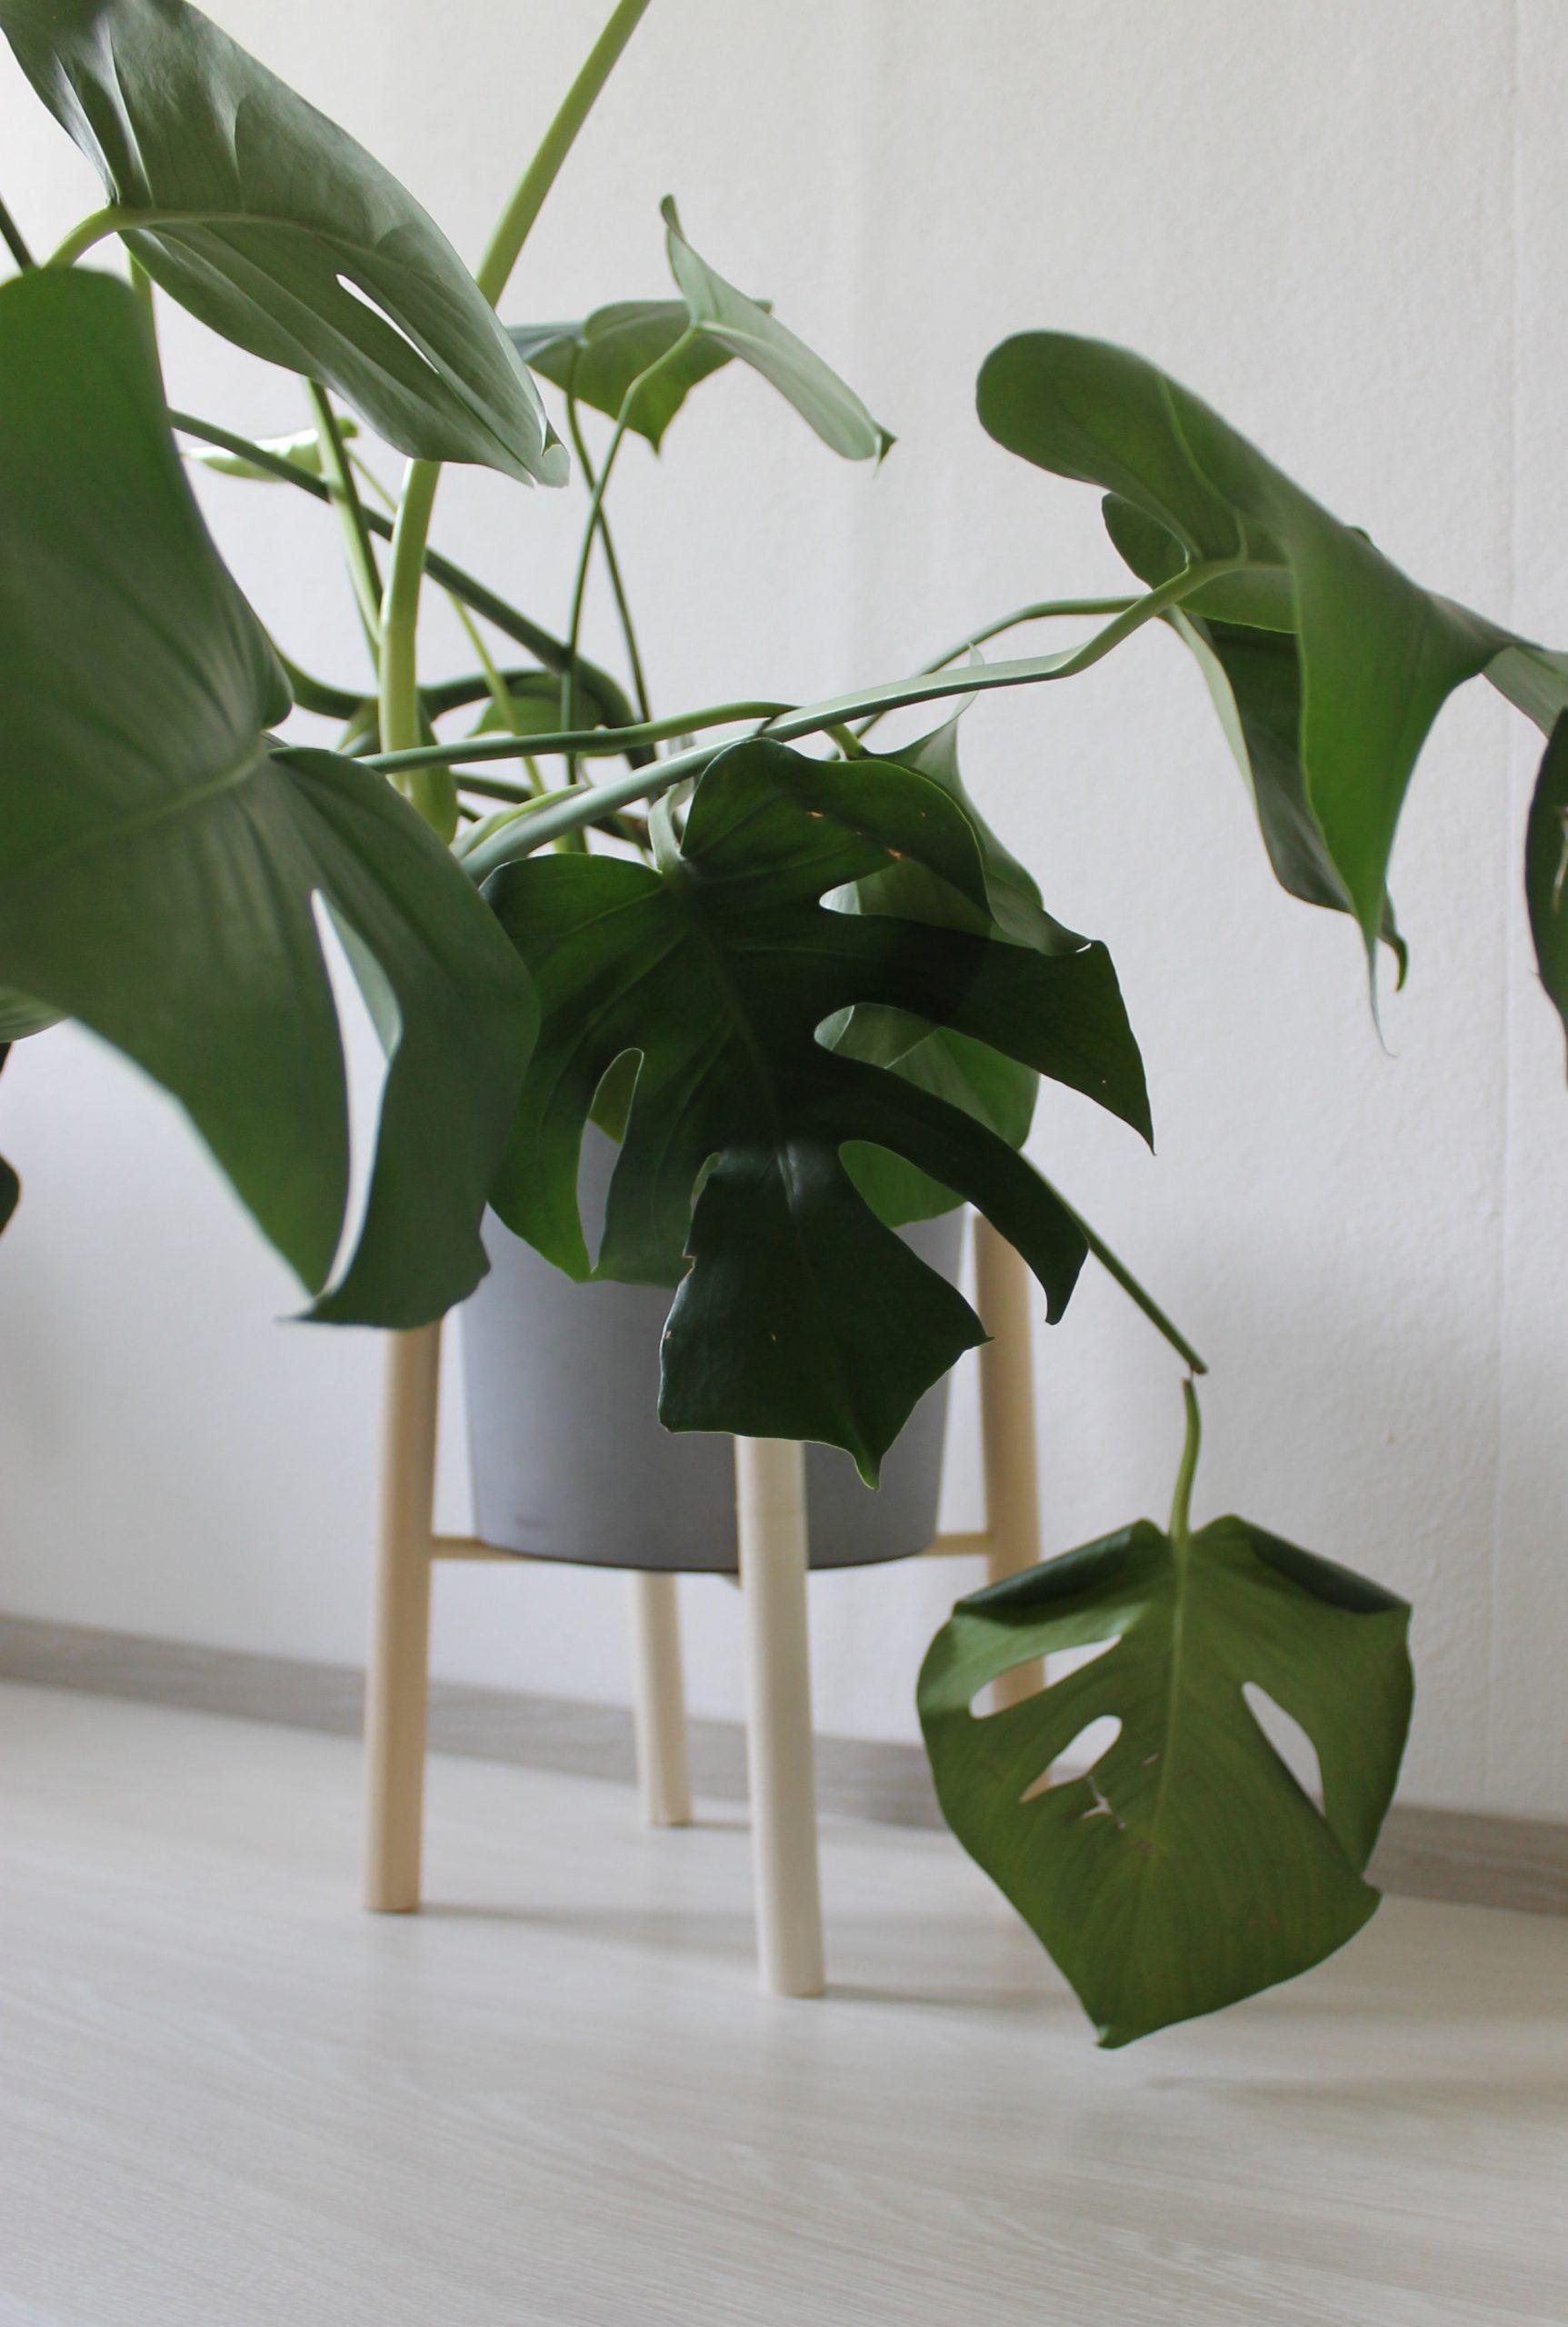 plantsssss